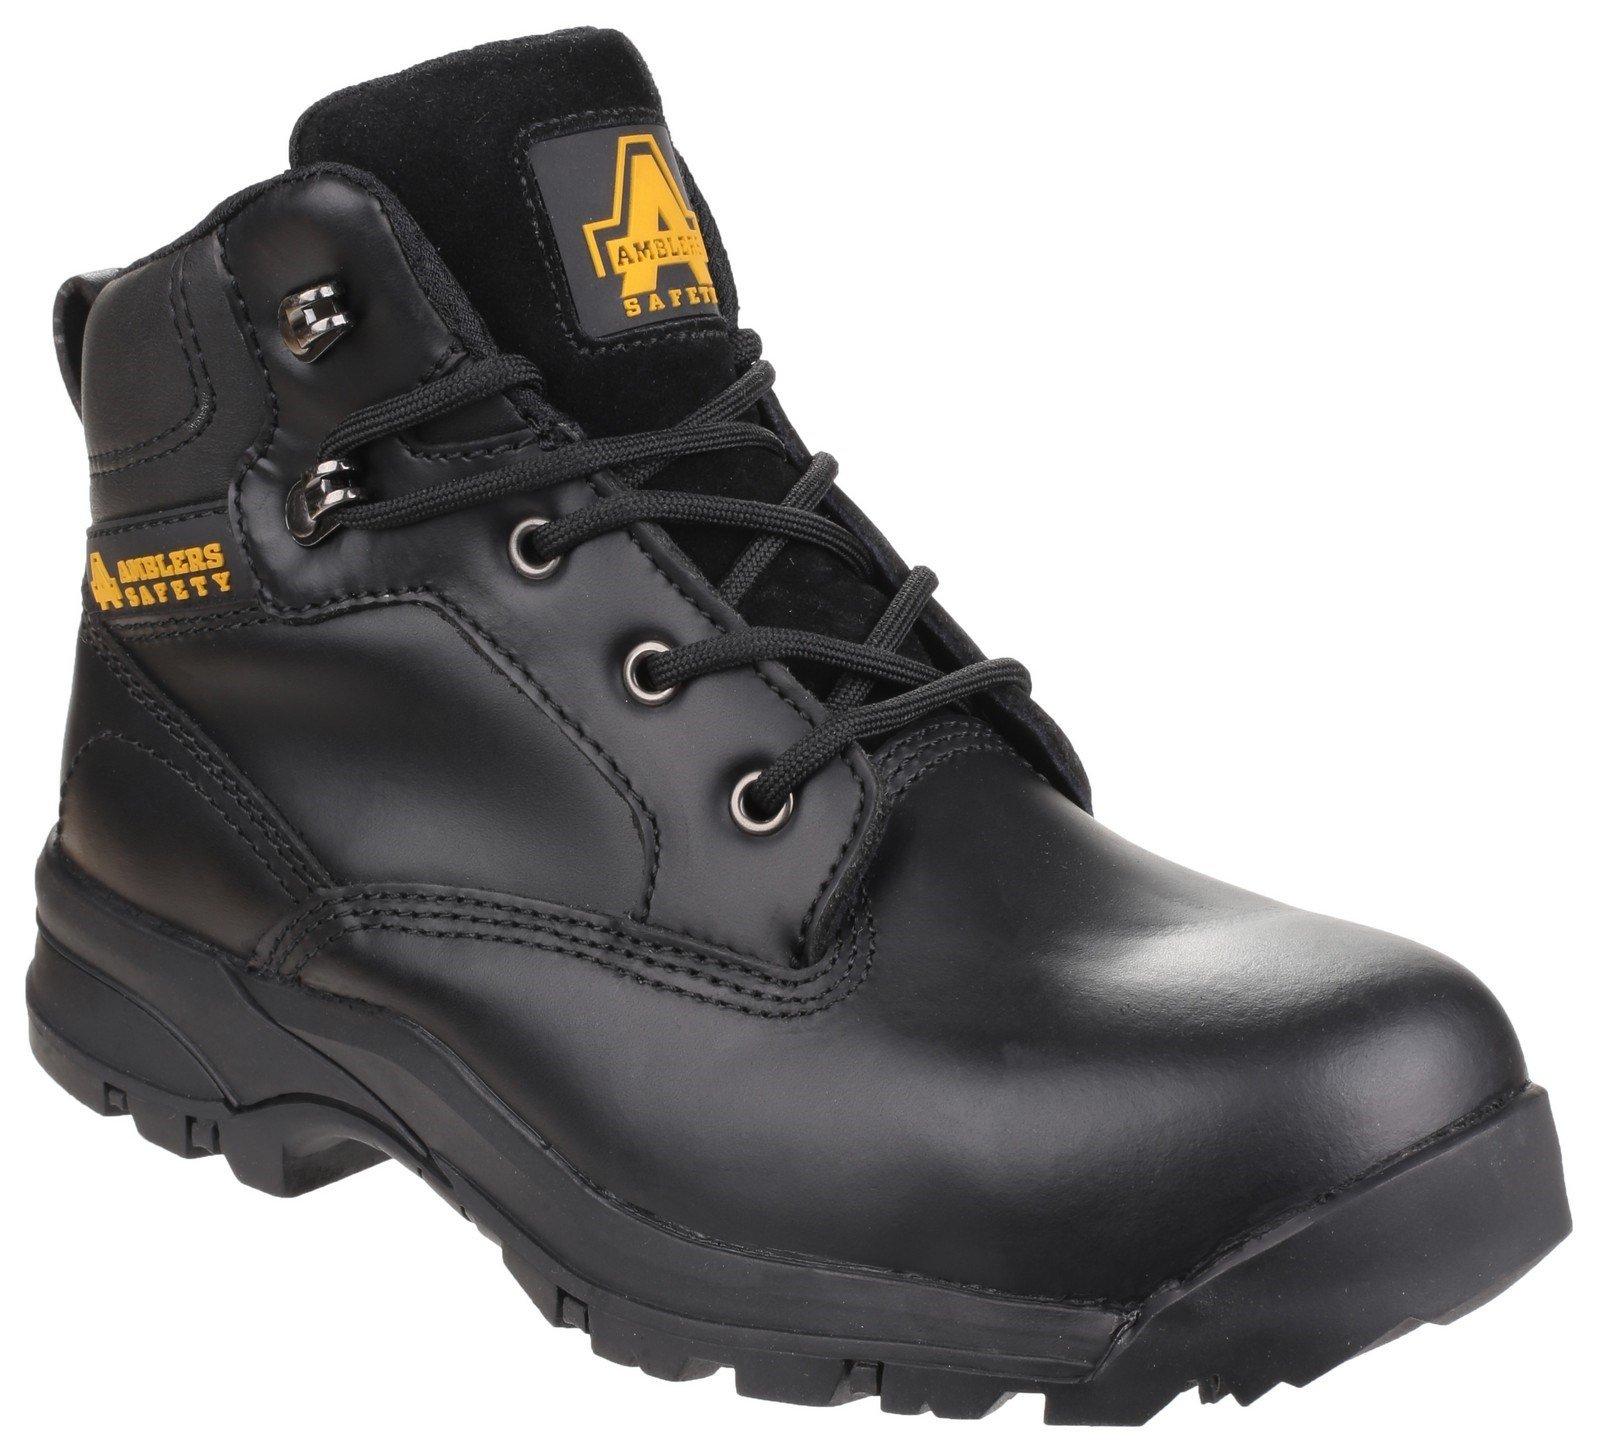 Amblers Women's Safety Ryton Lightweight Water-Resistant Boot Black 24185 - Black 3